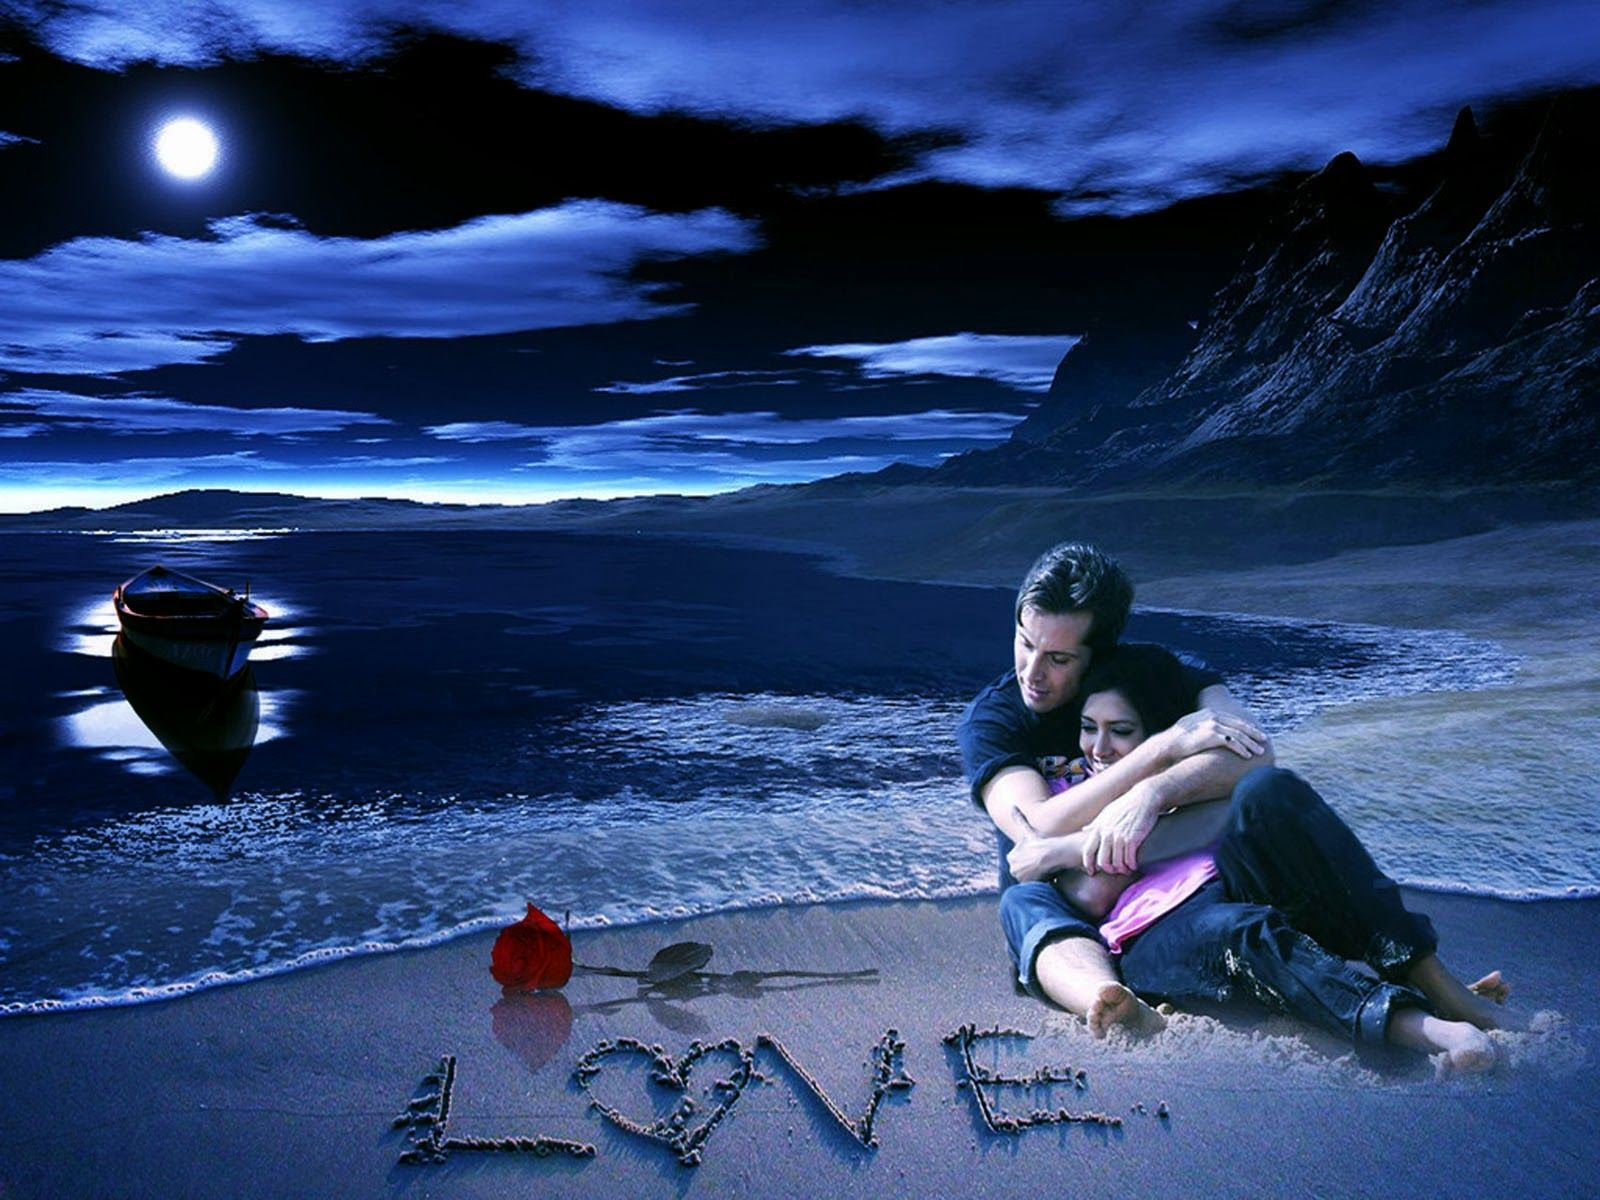 Wallpaper download free image - Wallpaper Of True Love Couple Hd Download Free Wallpaper Of True Love Couple Download Download